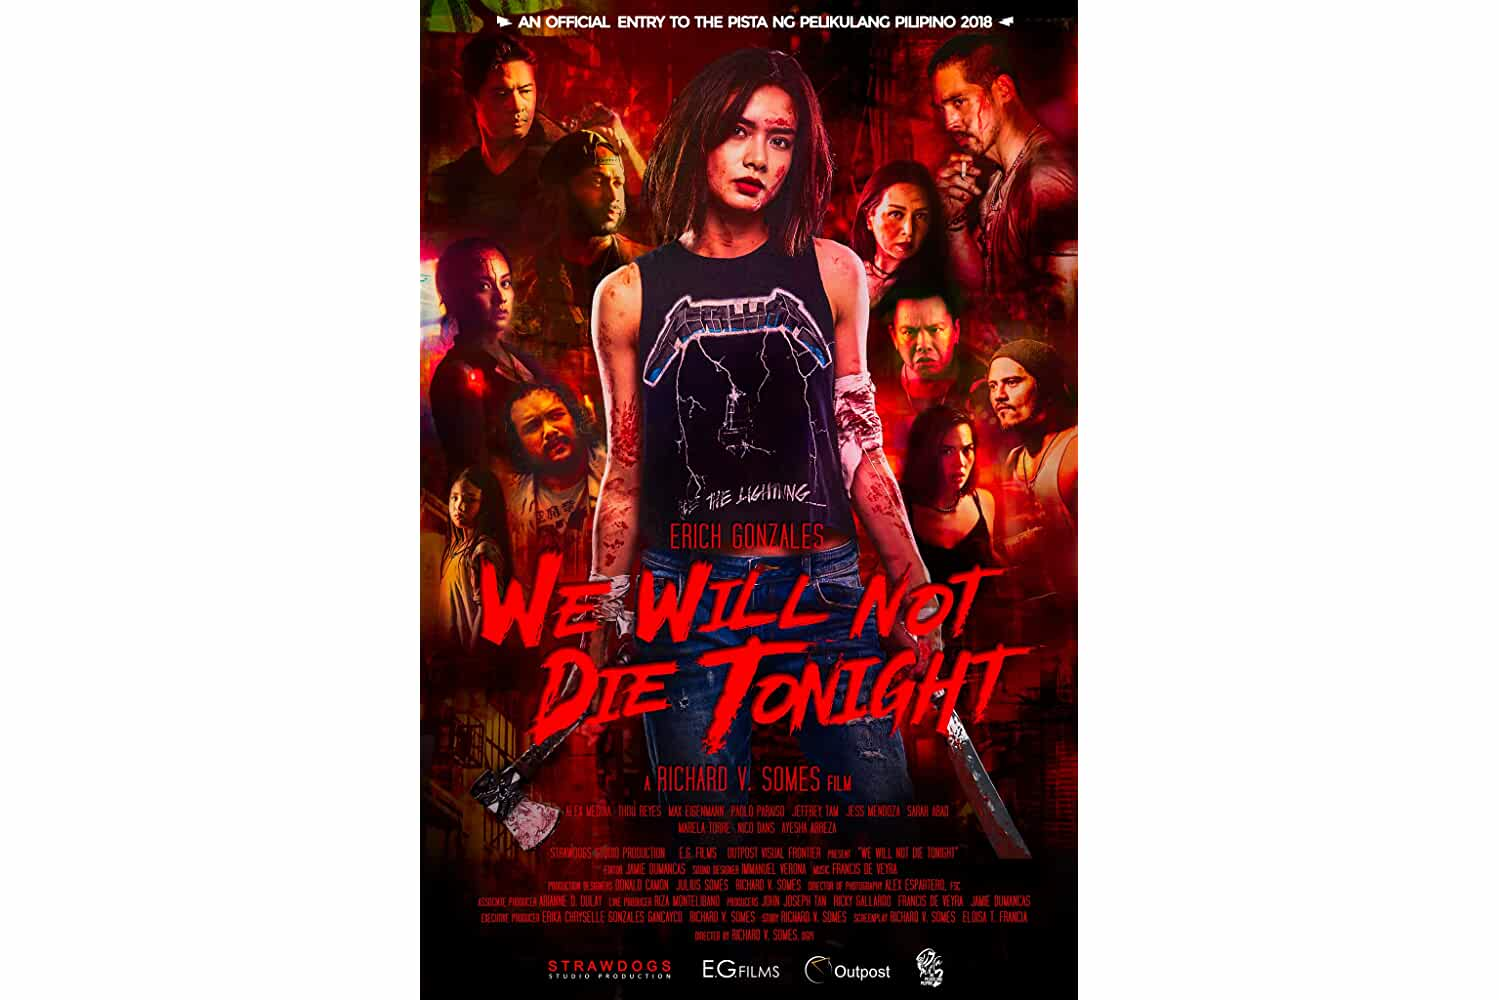 We Will Not Die Tonight (2018)